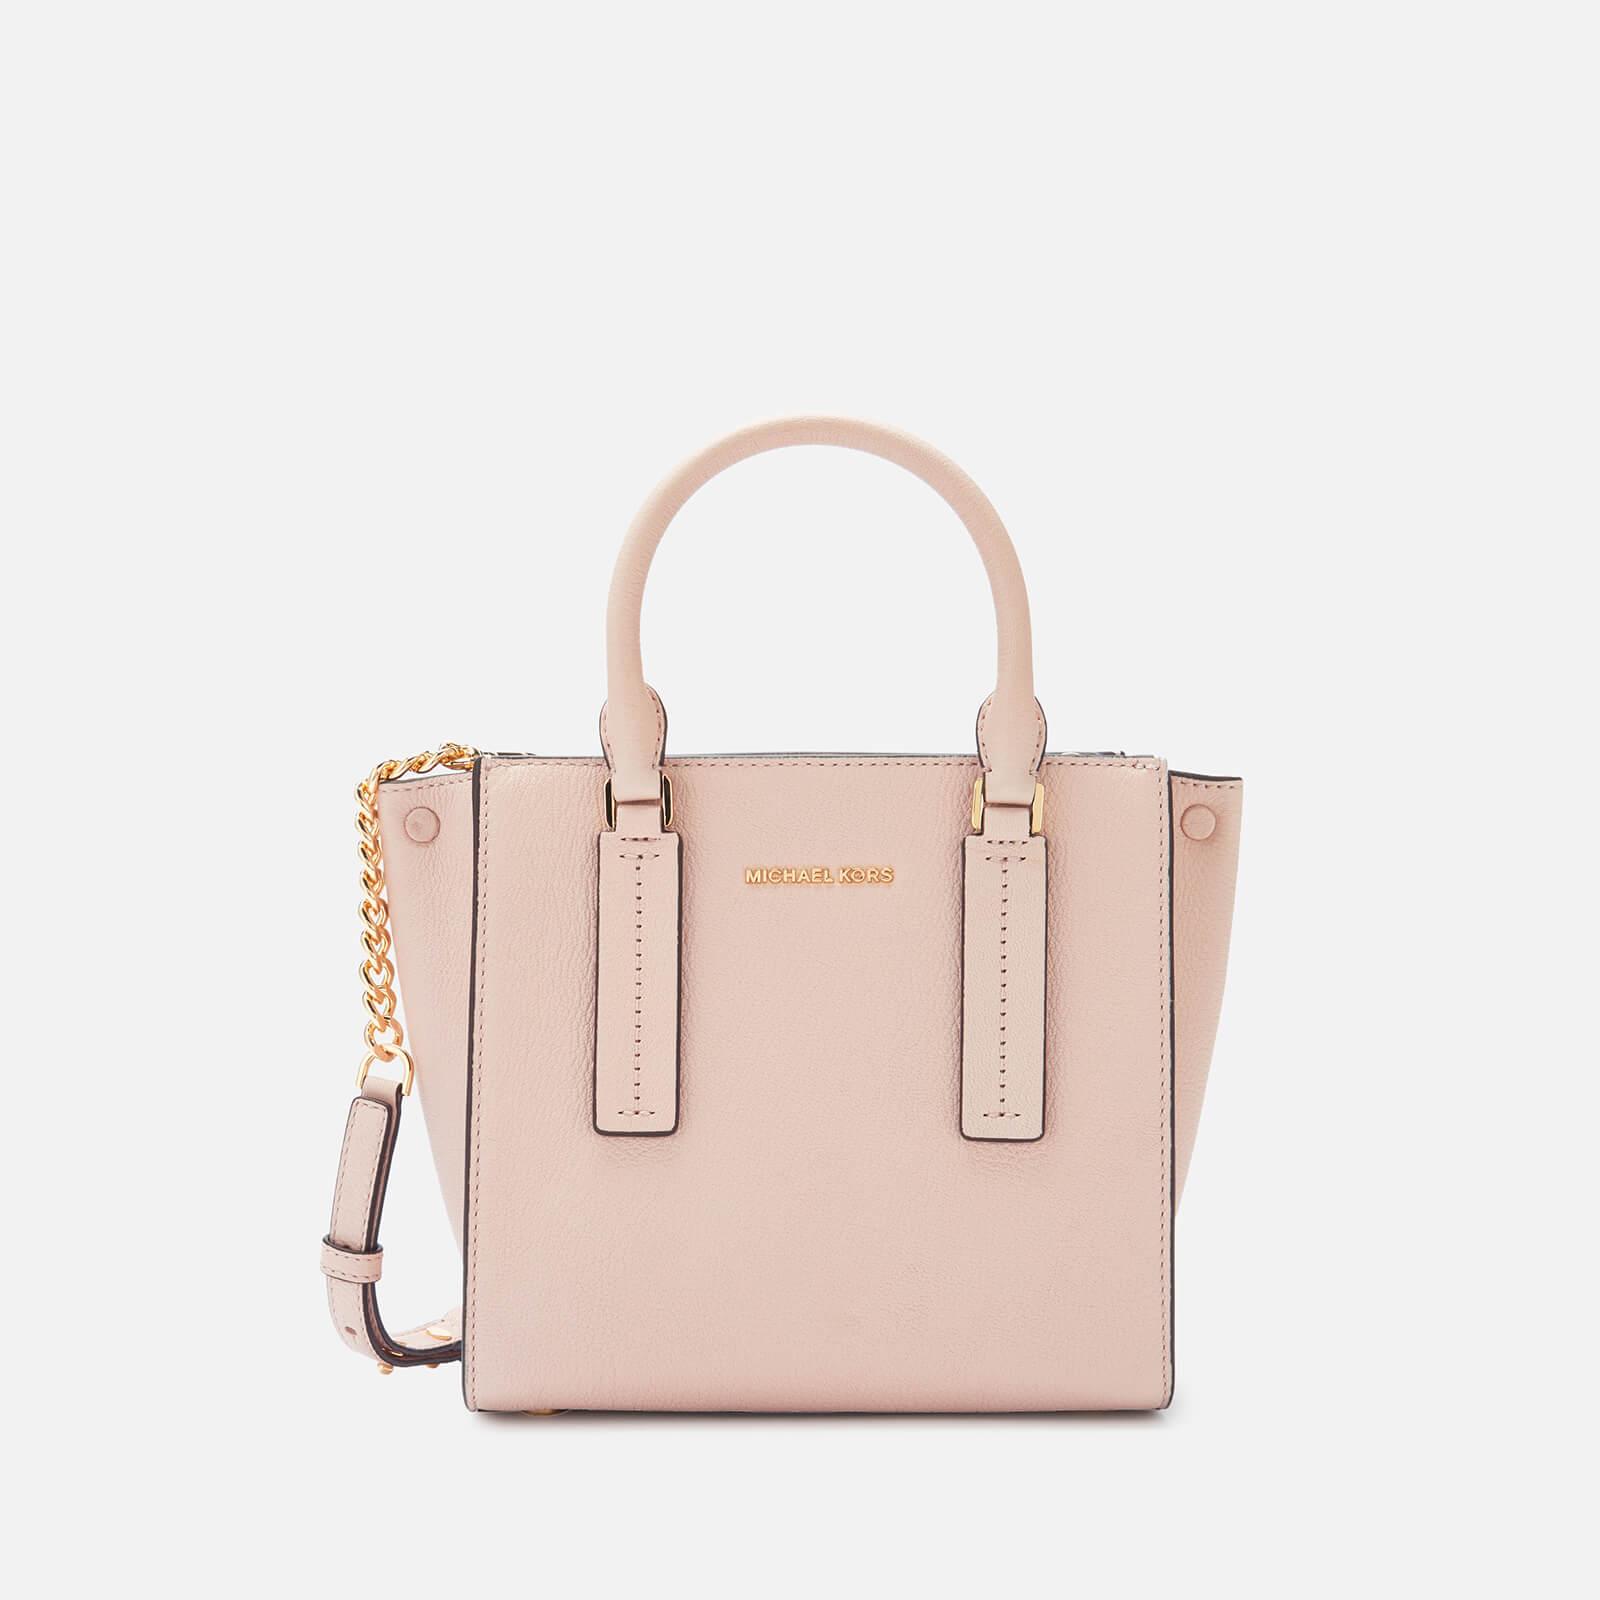 8beacc575 MICHAEL MICHAEL KORS Women's Alessa Medium Messenger Bag ...